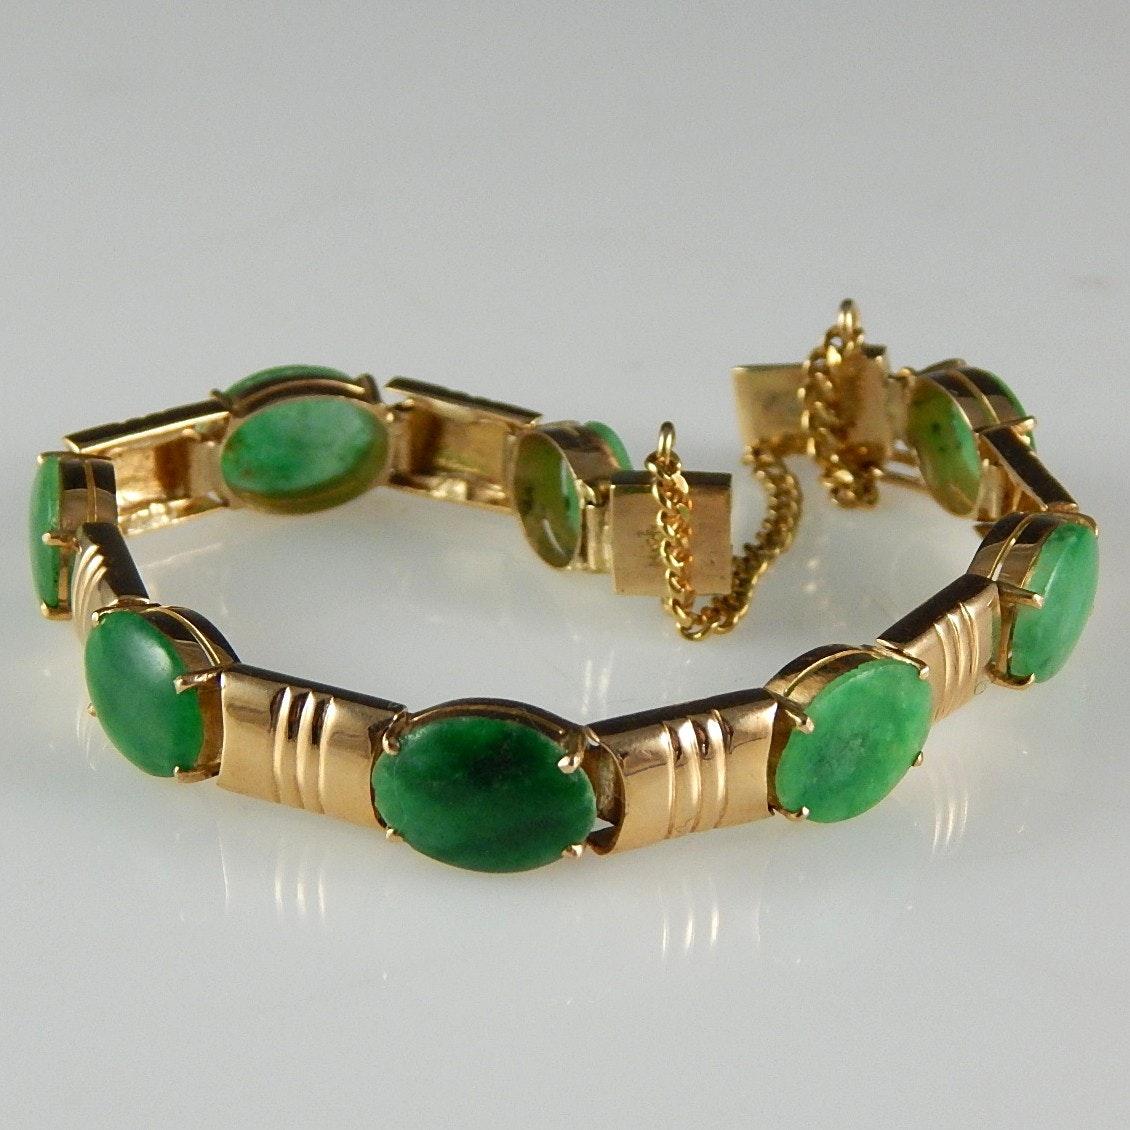 14K Yellow Gold and Jadeite Bracelet